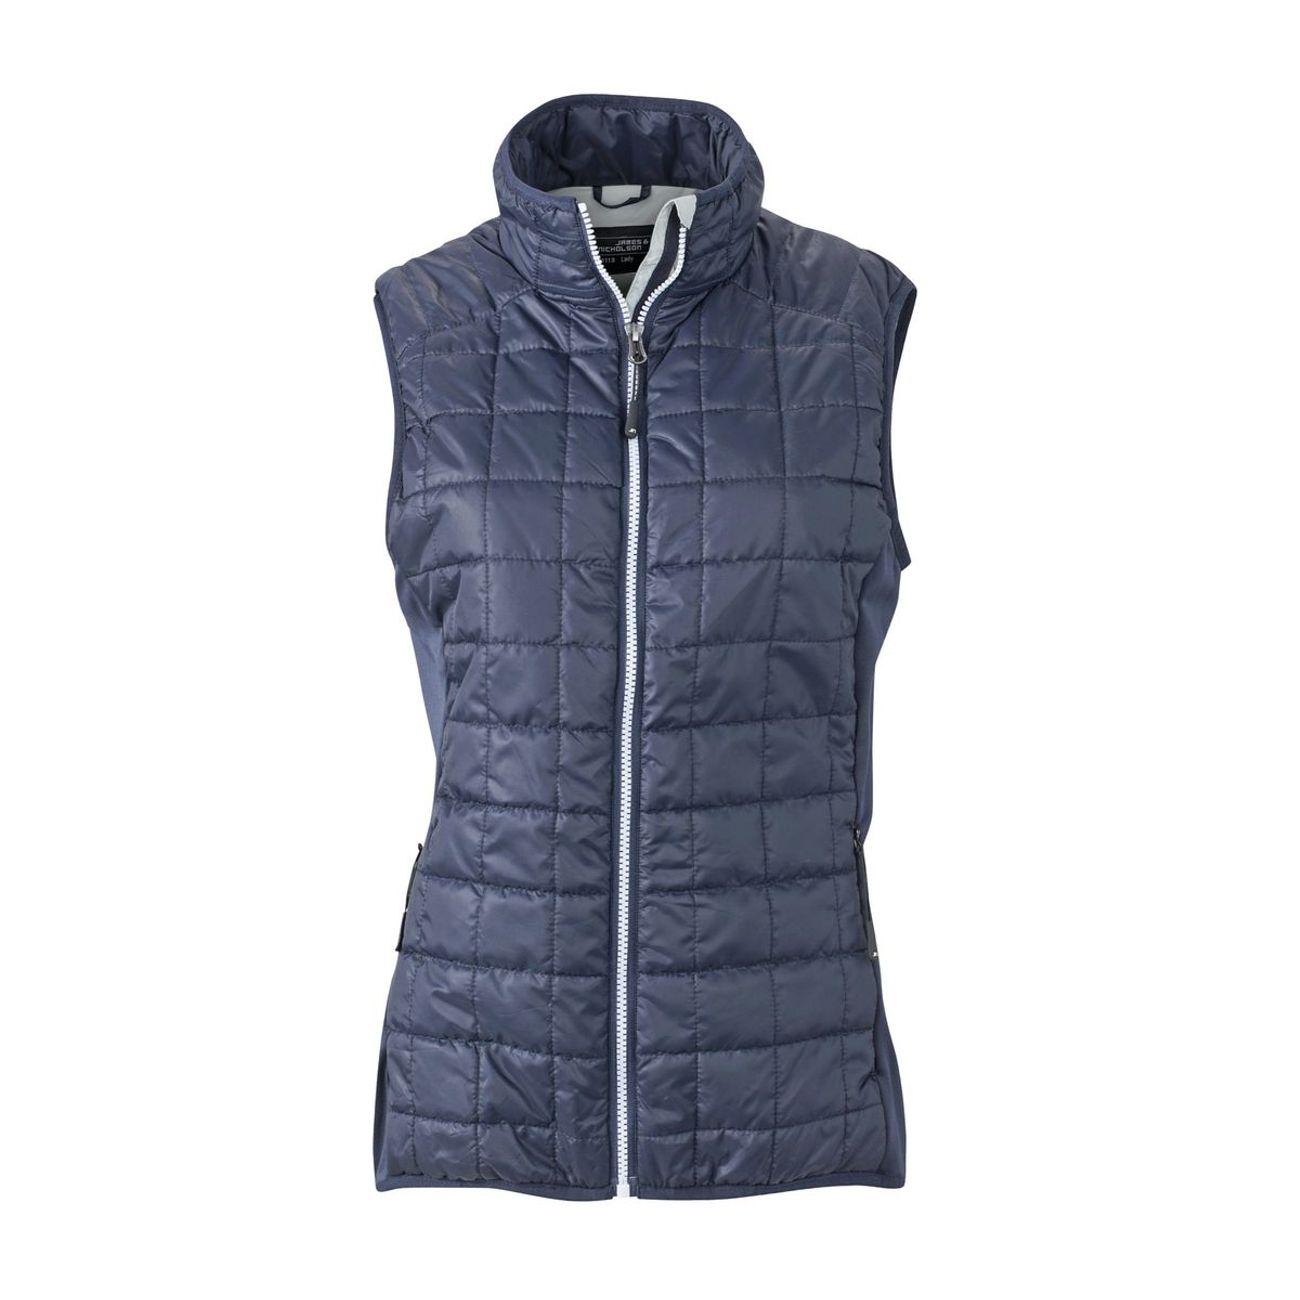 Hybride Femme MolletonnéJn1113 Manches ModeLifestyle Jamesamp; Nicholson Gilet Marine Sans Bleu TlF1J3uKc